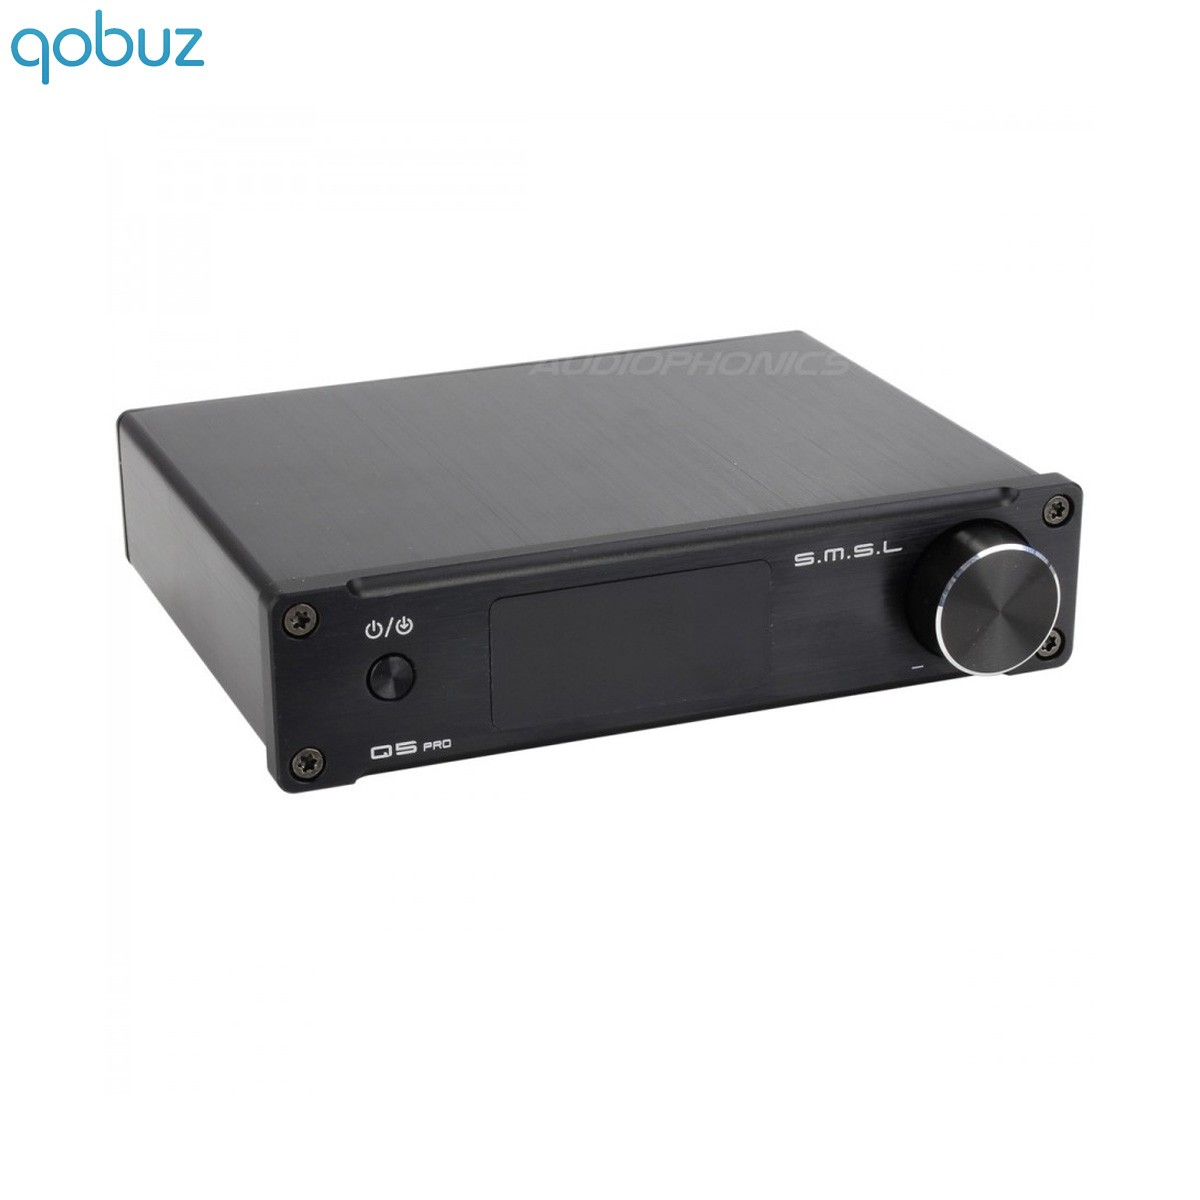 SMSL Q5 PRO FDA Amplifier TAS5342 2x45W + Subwoofer output / 4 Ohm CS5341 SA9023 Black